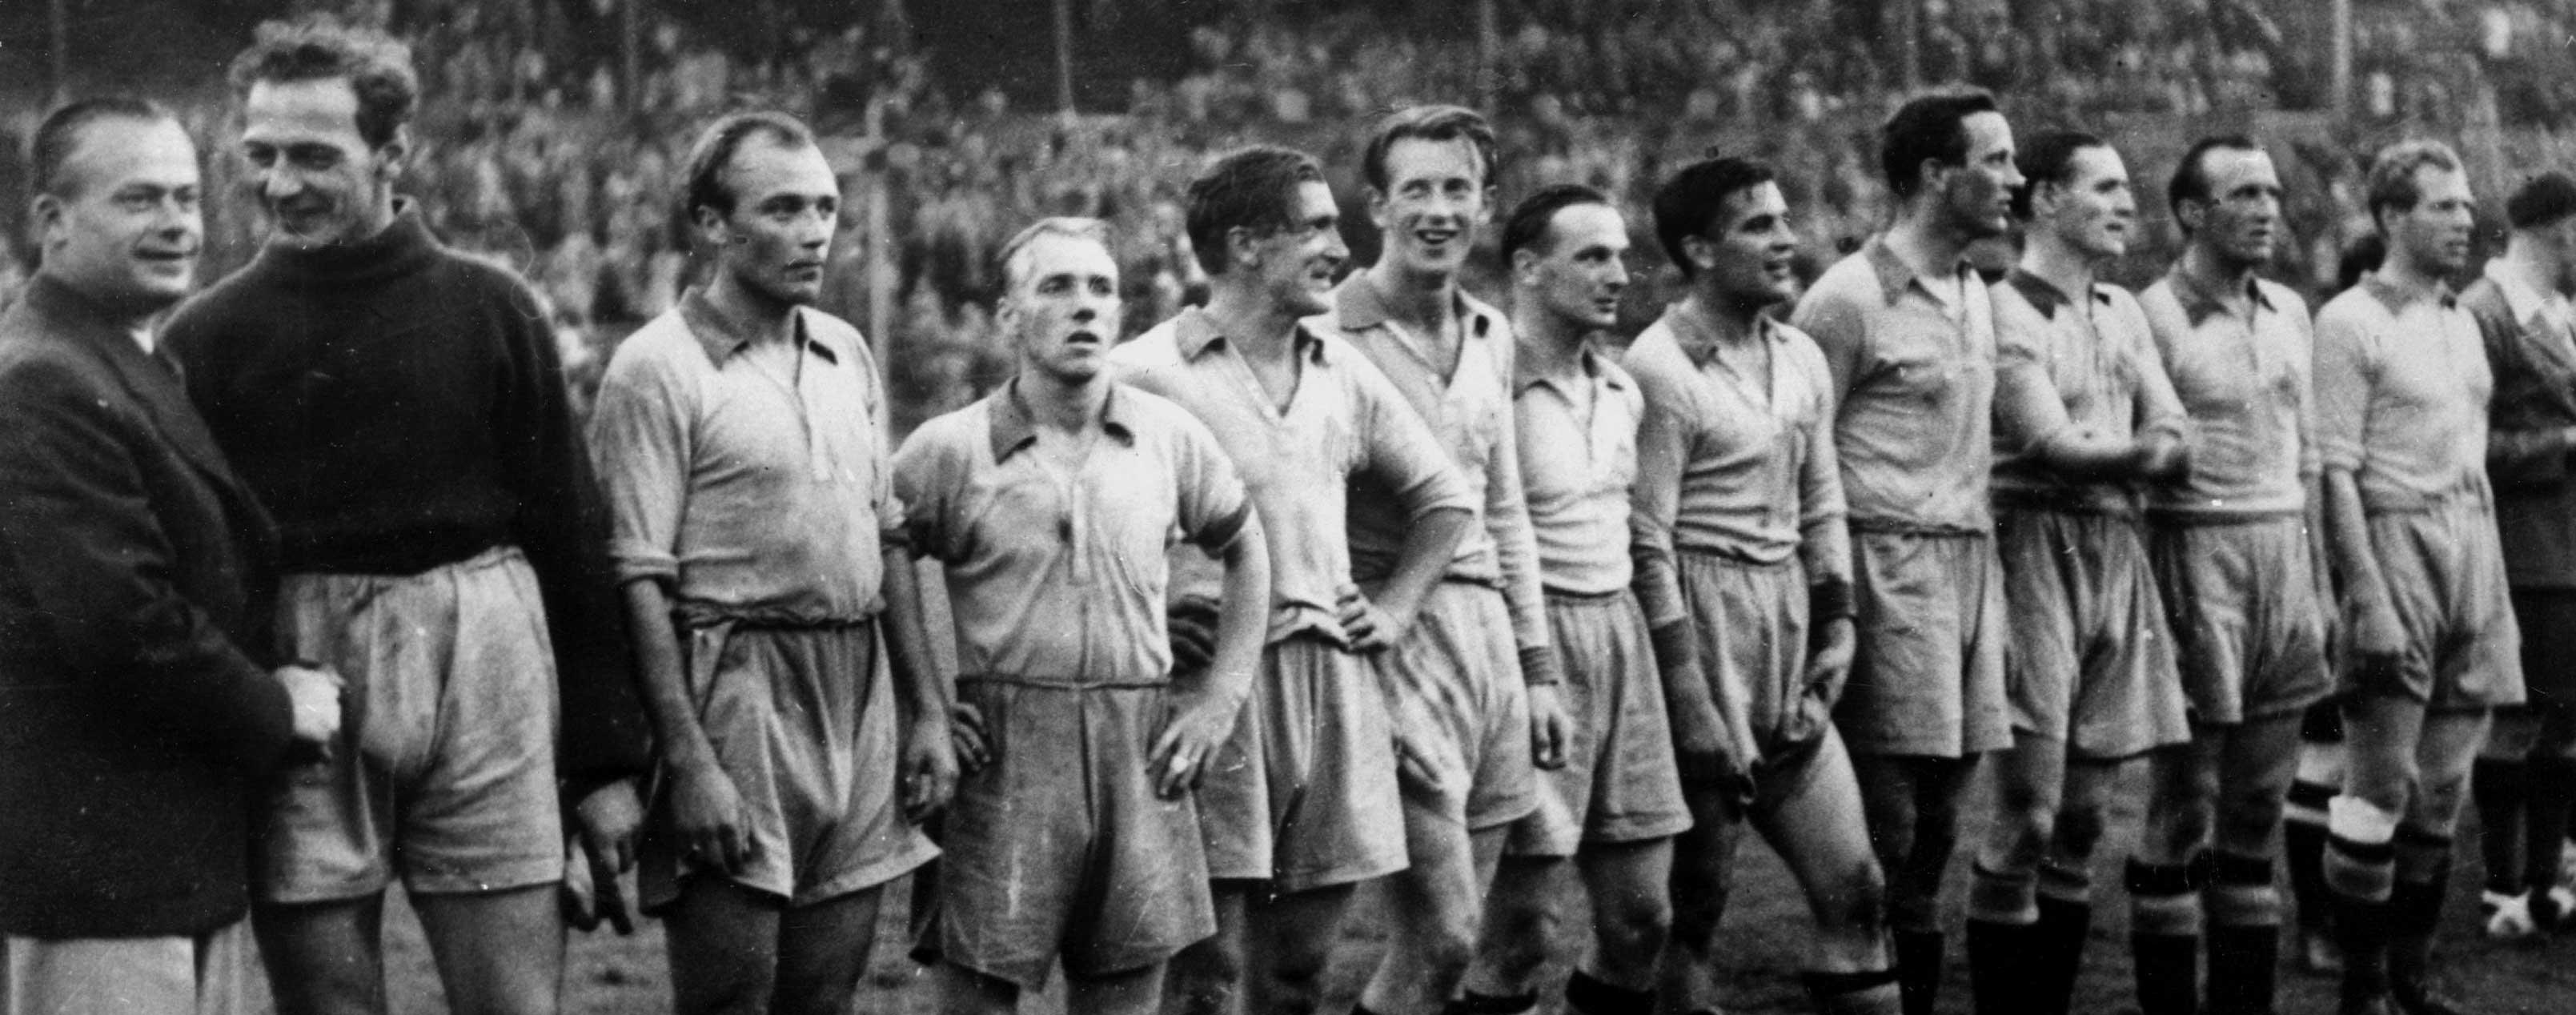 OS-guld i fotboll fyller 70 år - Sveriges Olympiska Kommitté 952d53165cbb2